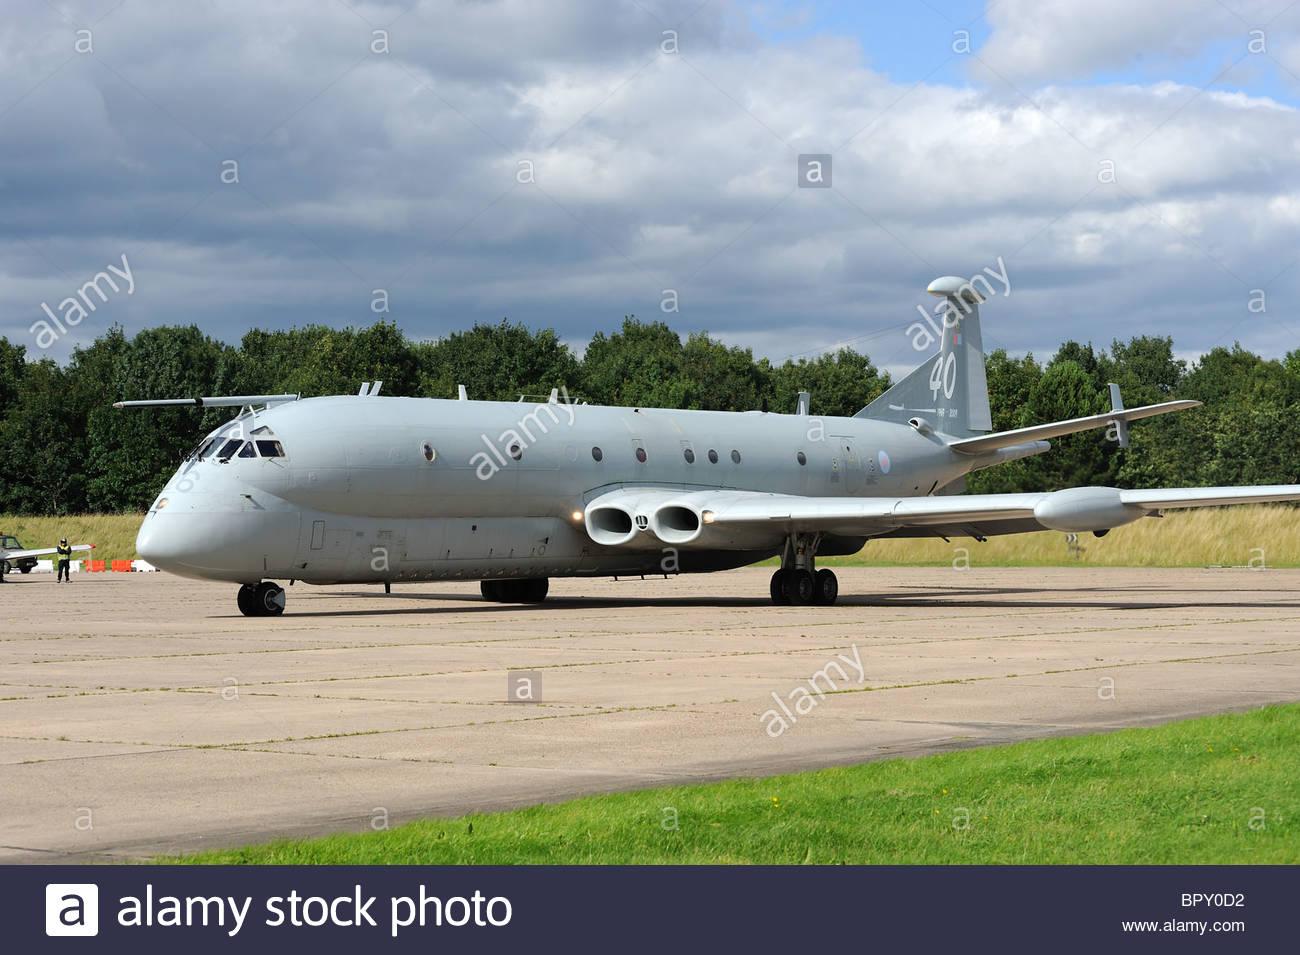 Nimrod MR2 maritime patrol aircraft on the runway - Stock Image